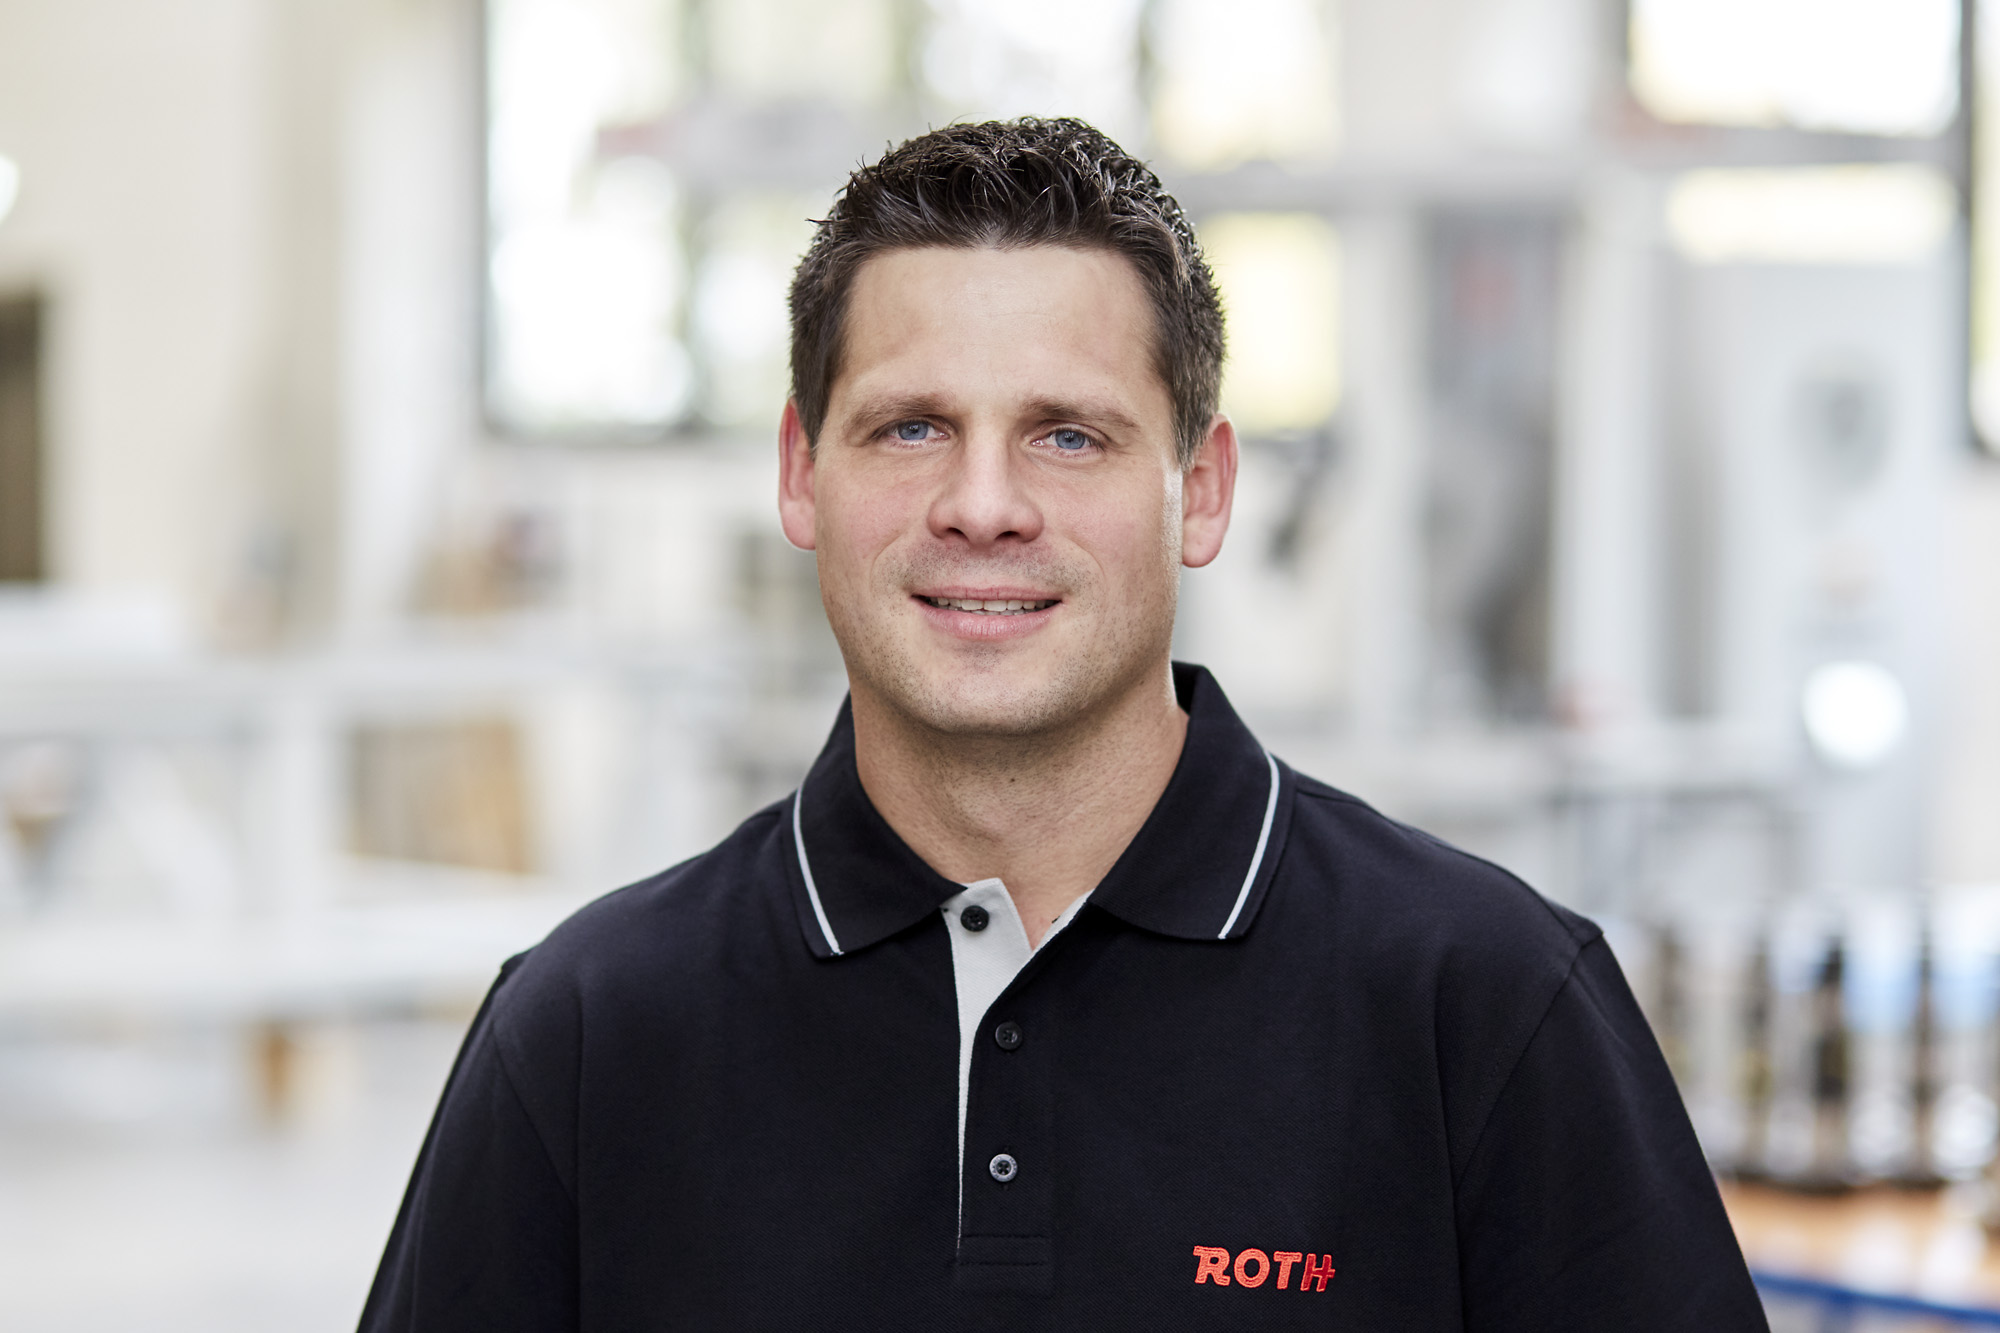 Christoph Merkert - Roth Steuerungstechnik